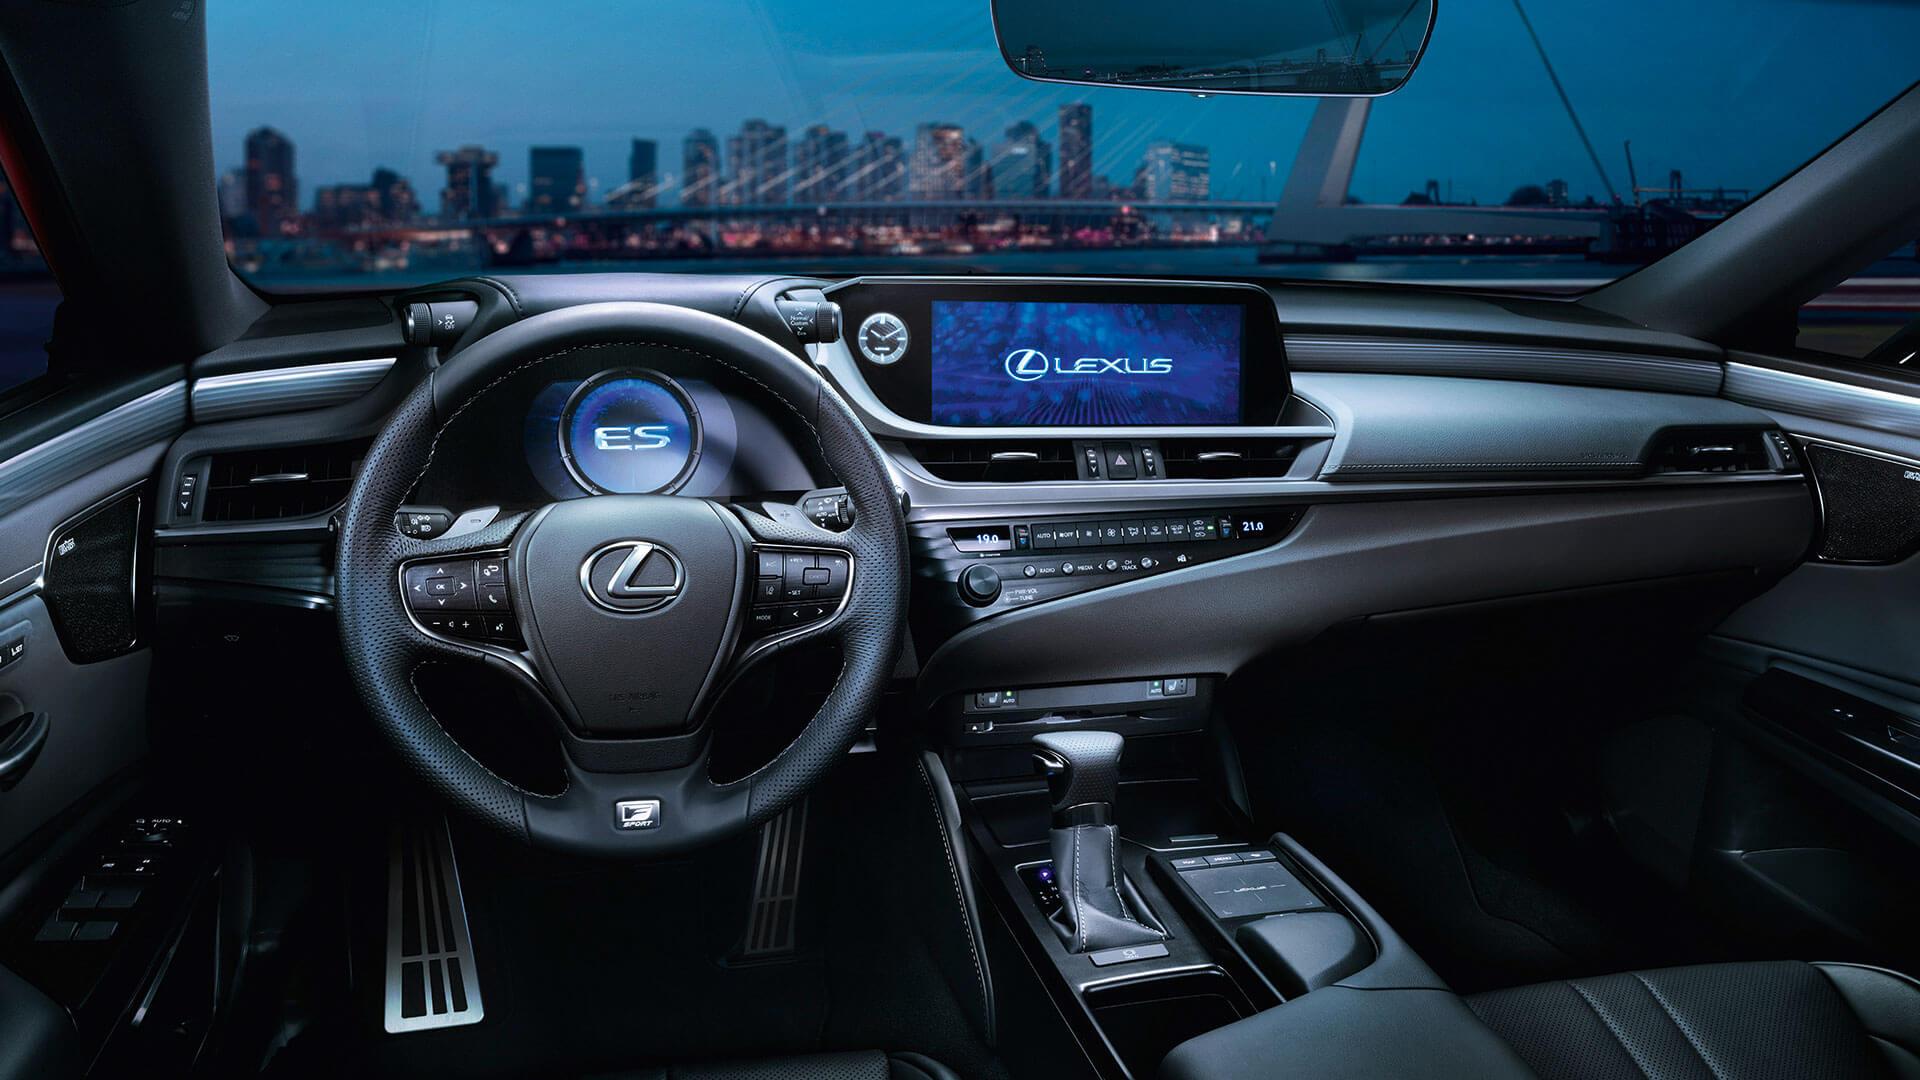 Lexus начинает прием заказов на новое поколение элегантного бизнес-седана Lexus ES